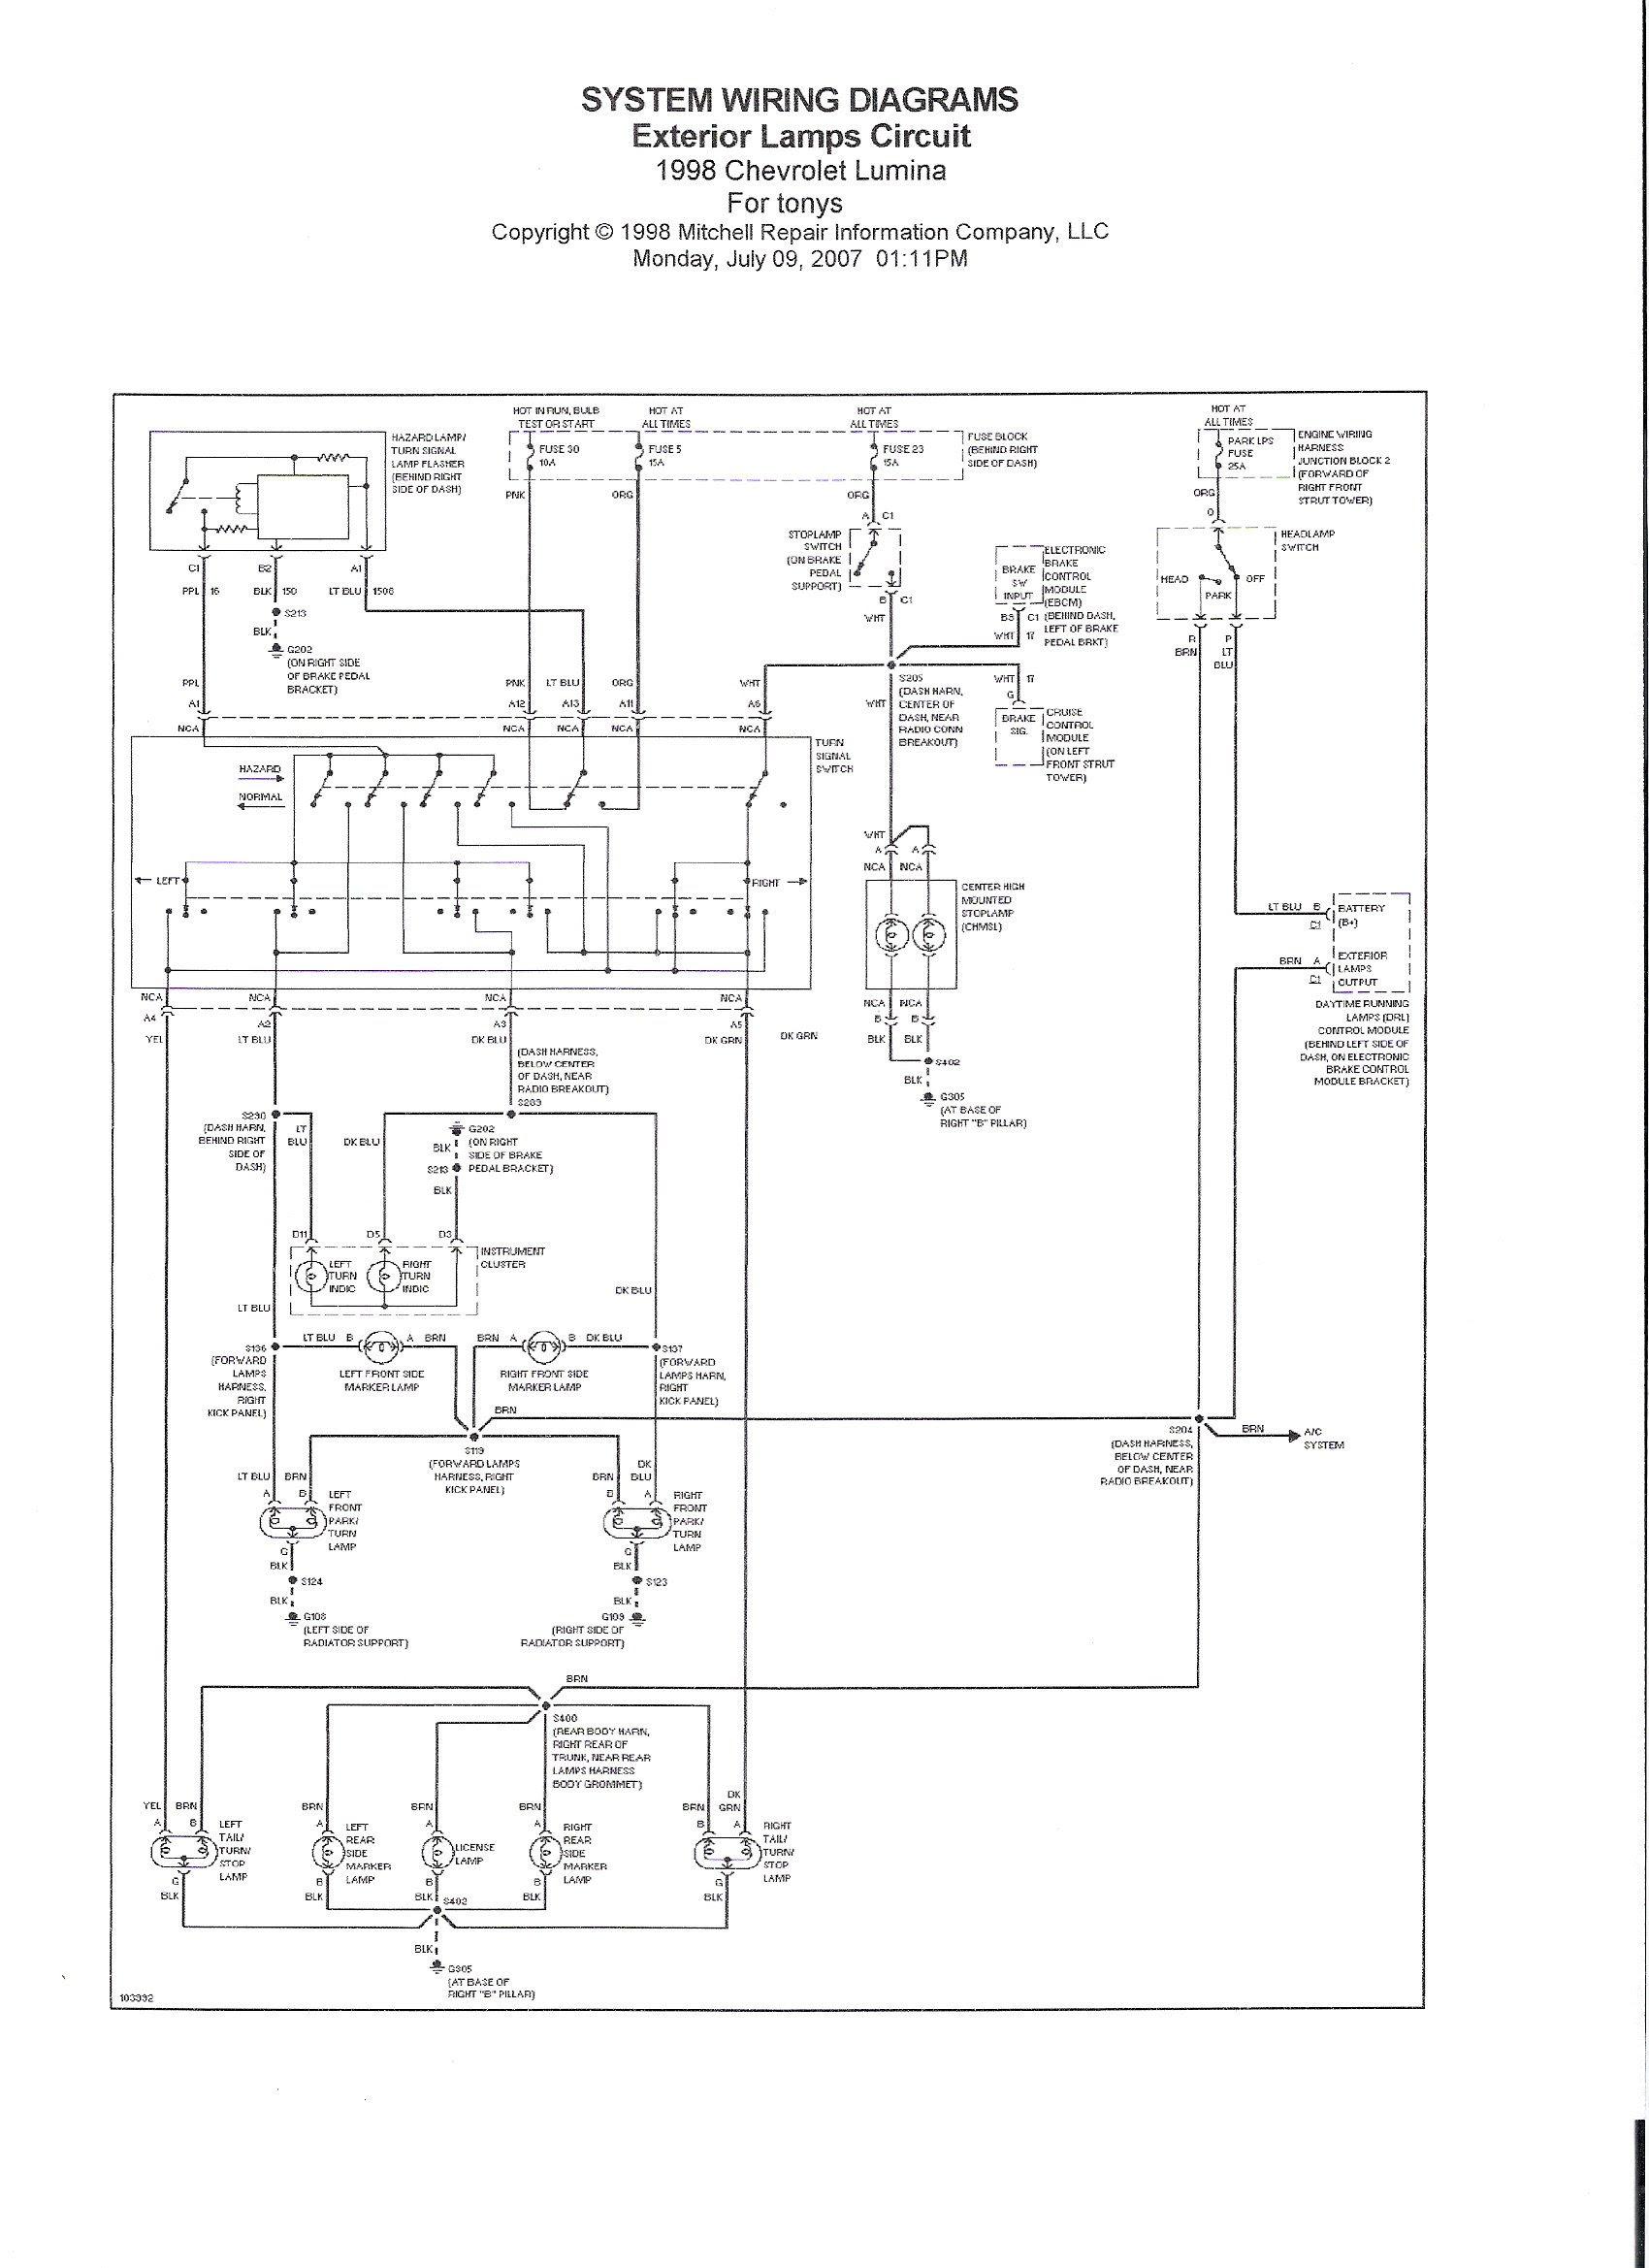 1998 Chev Lumina - Rear brake lights do not work. (3rd ...